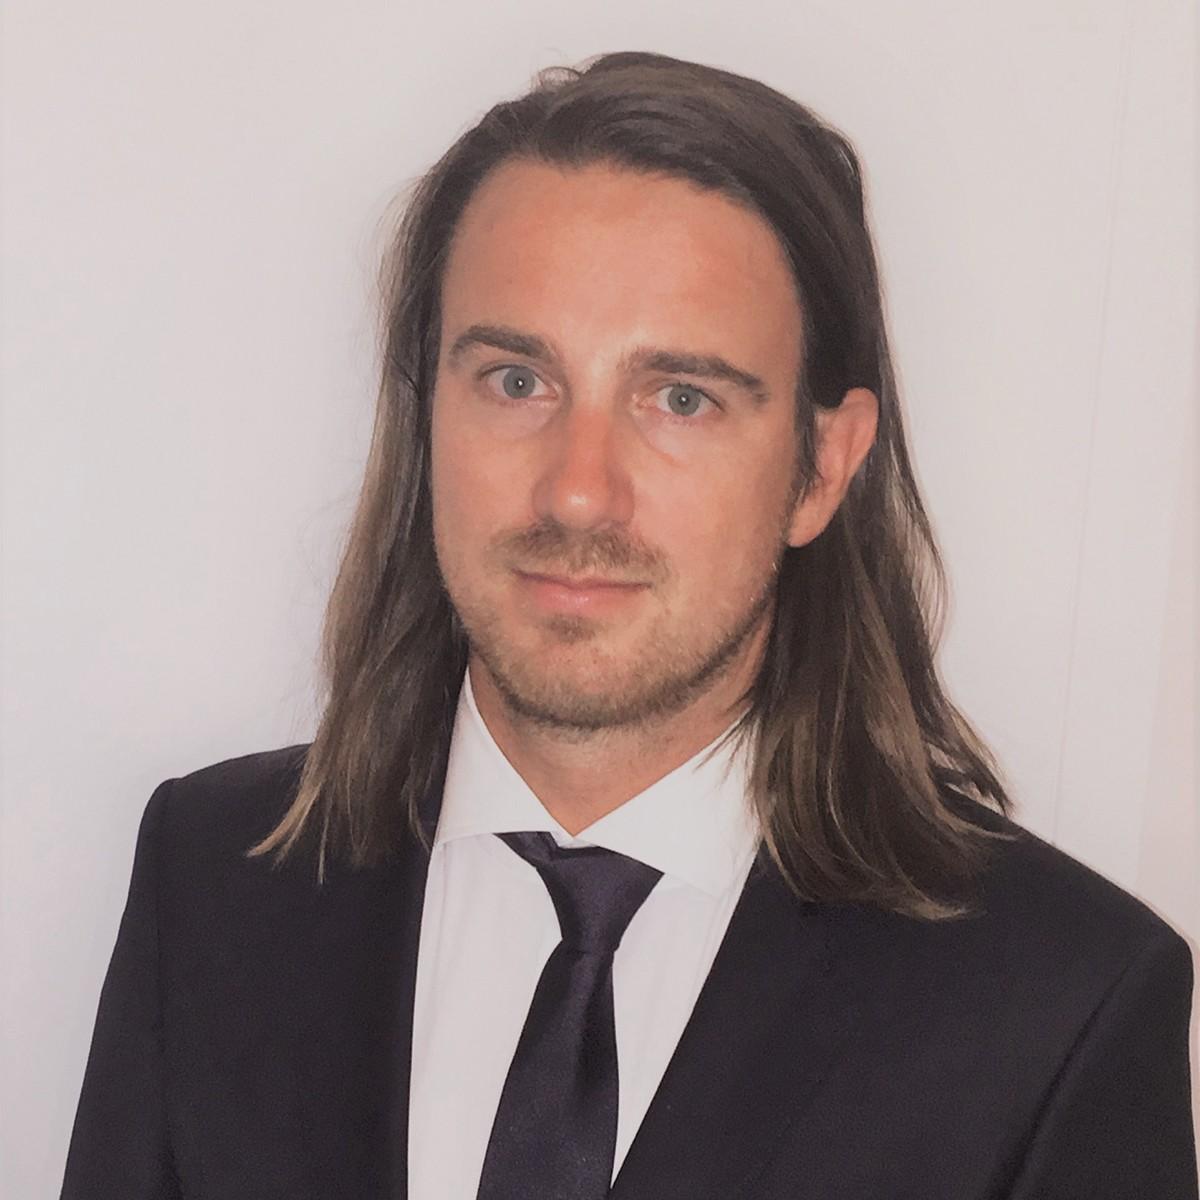 Stefan Lucchini